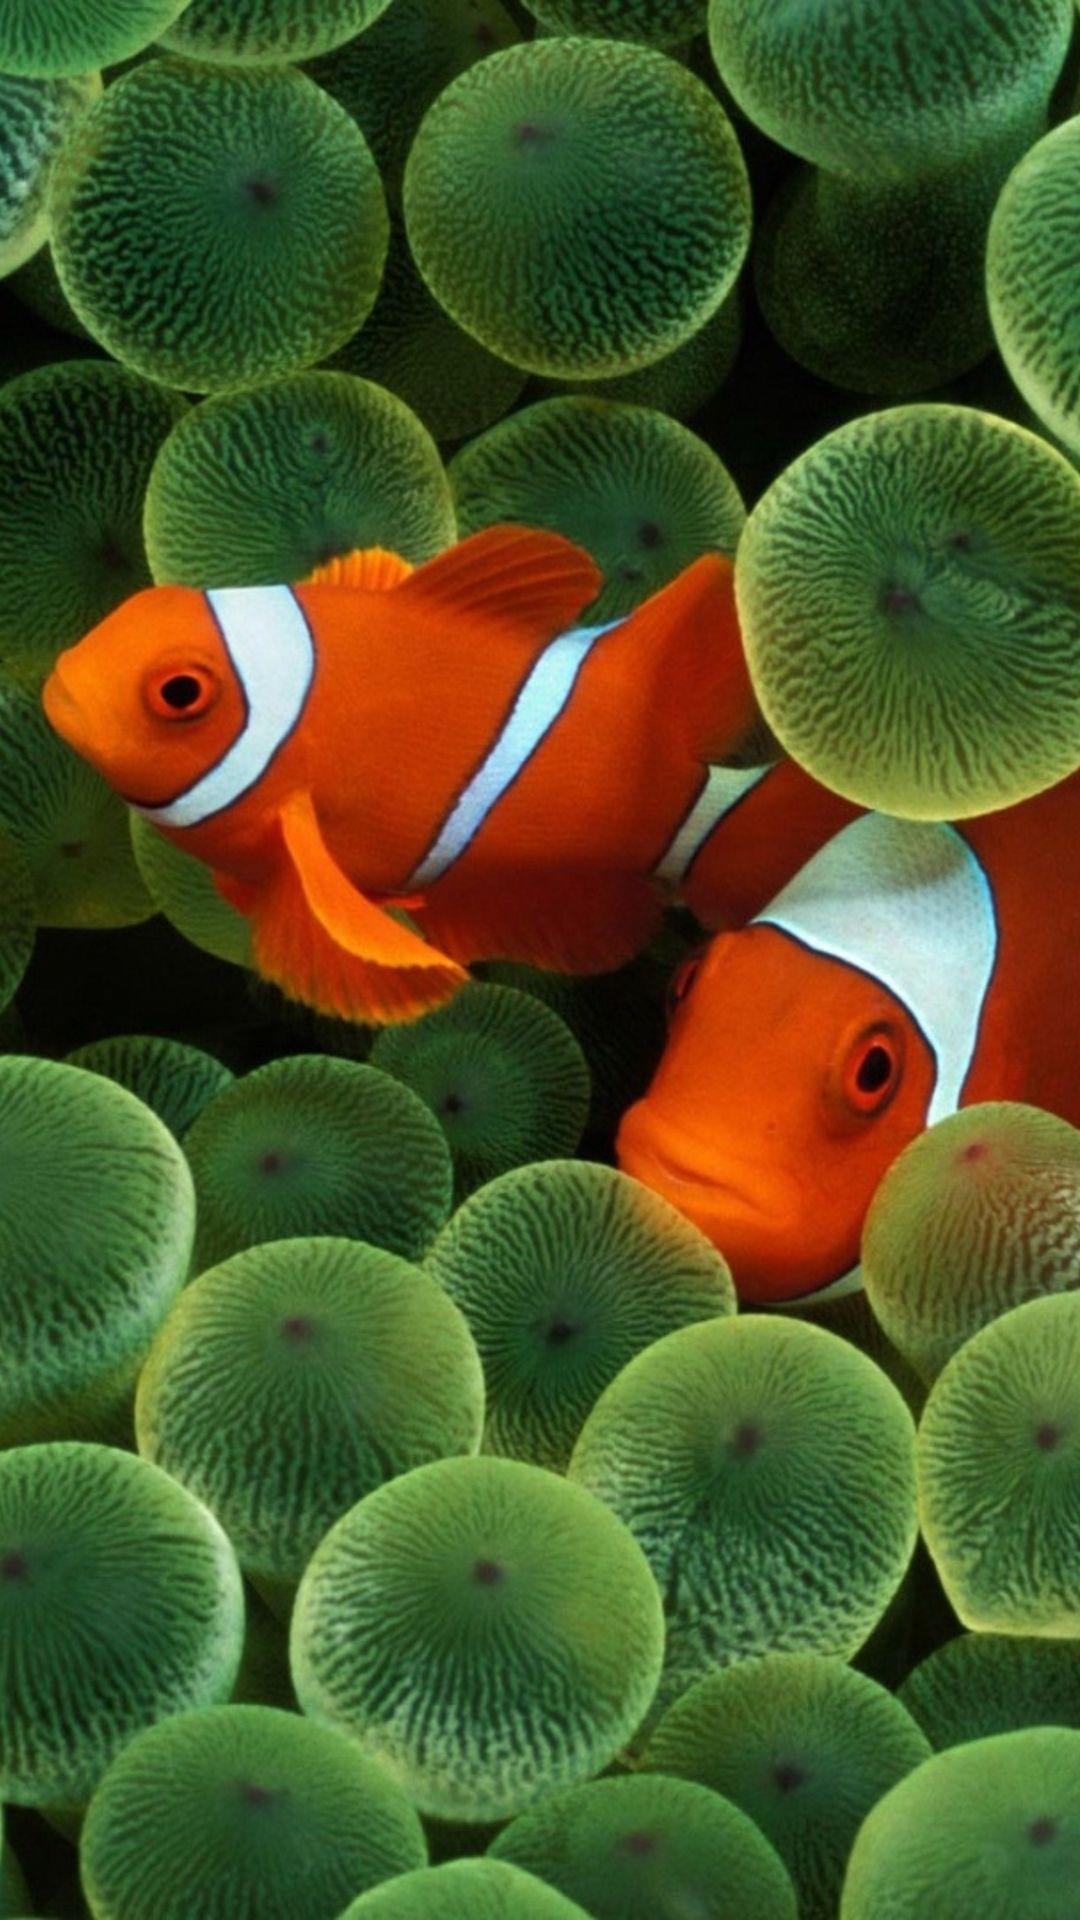 Wallpaper iphone nemo - Marlin And Nemo 1080x1920